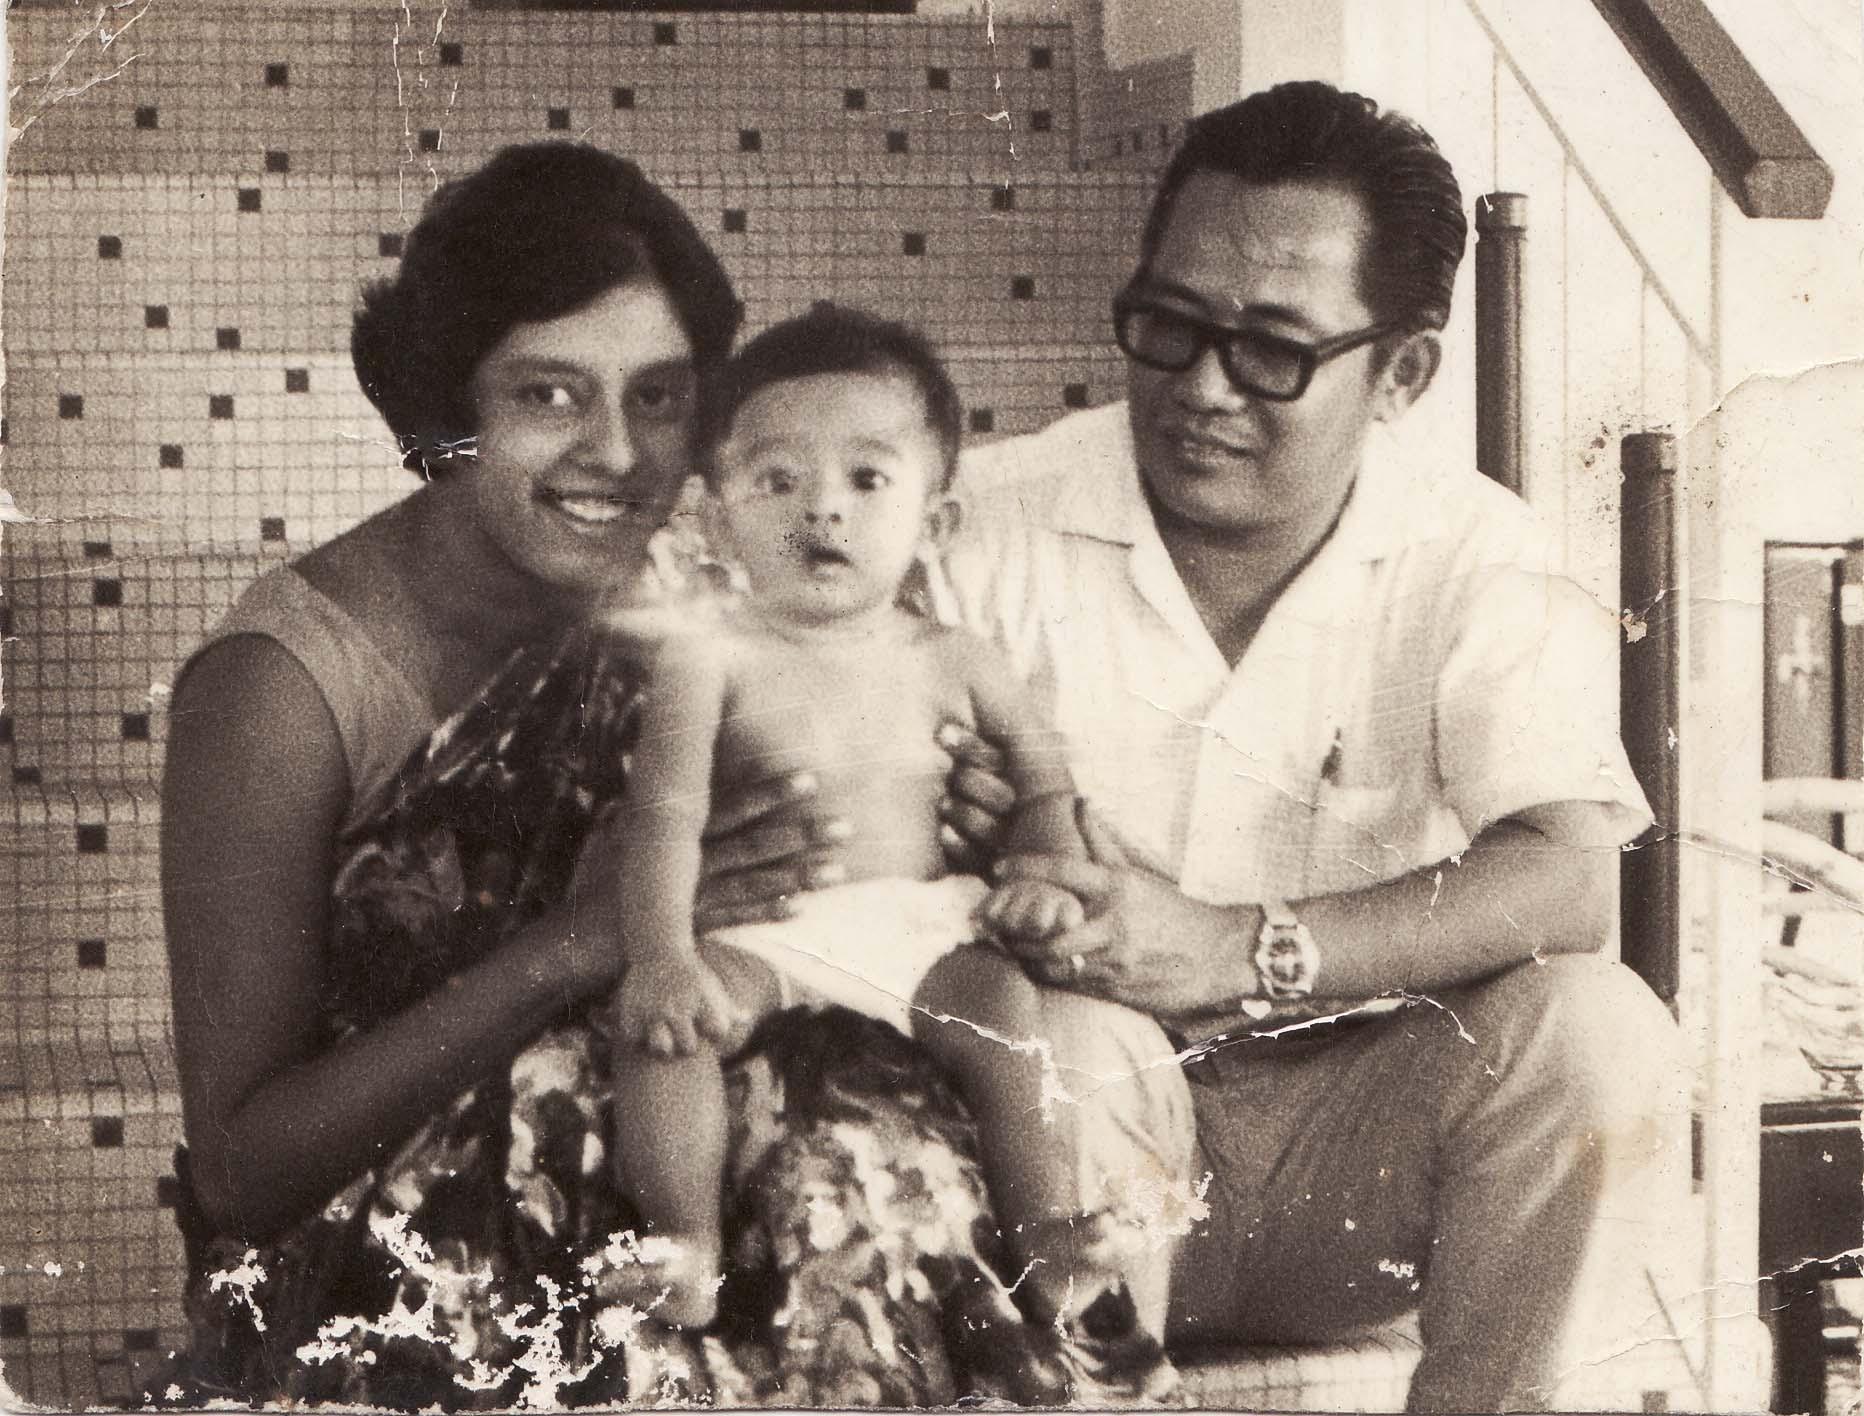 Khoo with wife Rathi and son Eddin Khoo